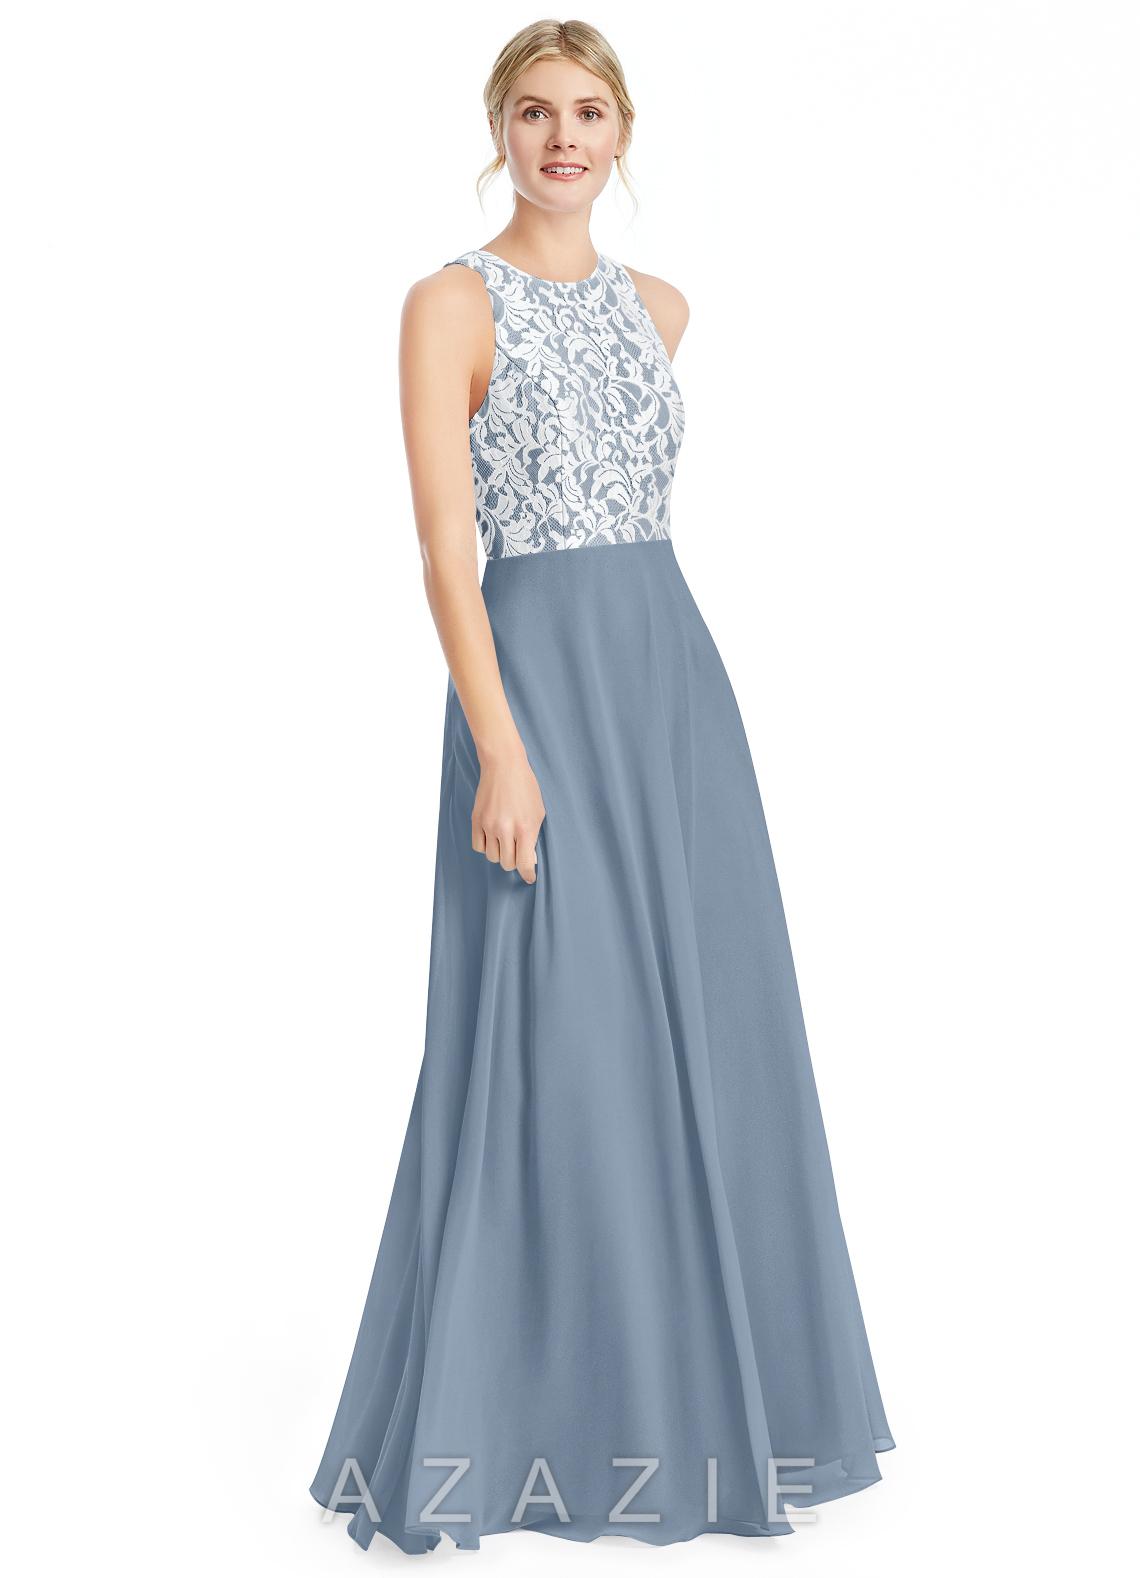 e56194172e4 Azazie Kate Bridesmaid Dress - Dusty Blue